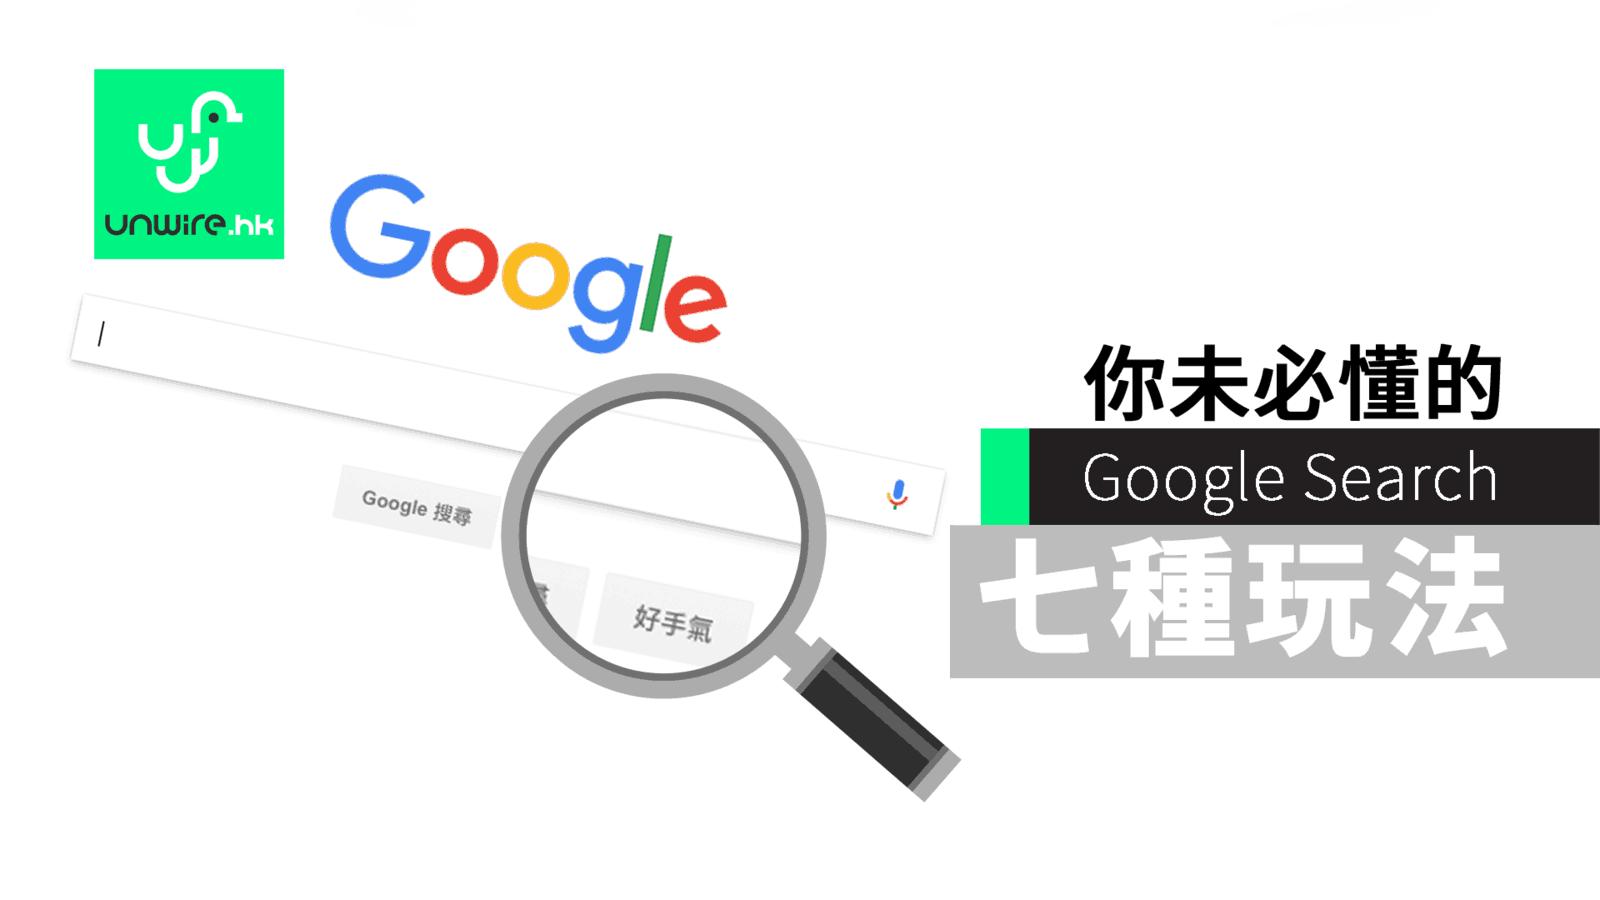 【unwire 小技巧】你未必懂的 Google Search 7 種玩法(更新)